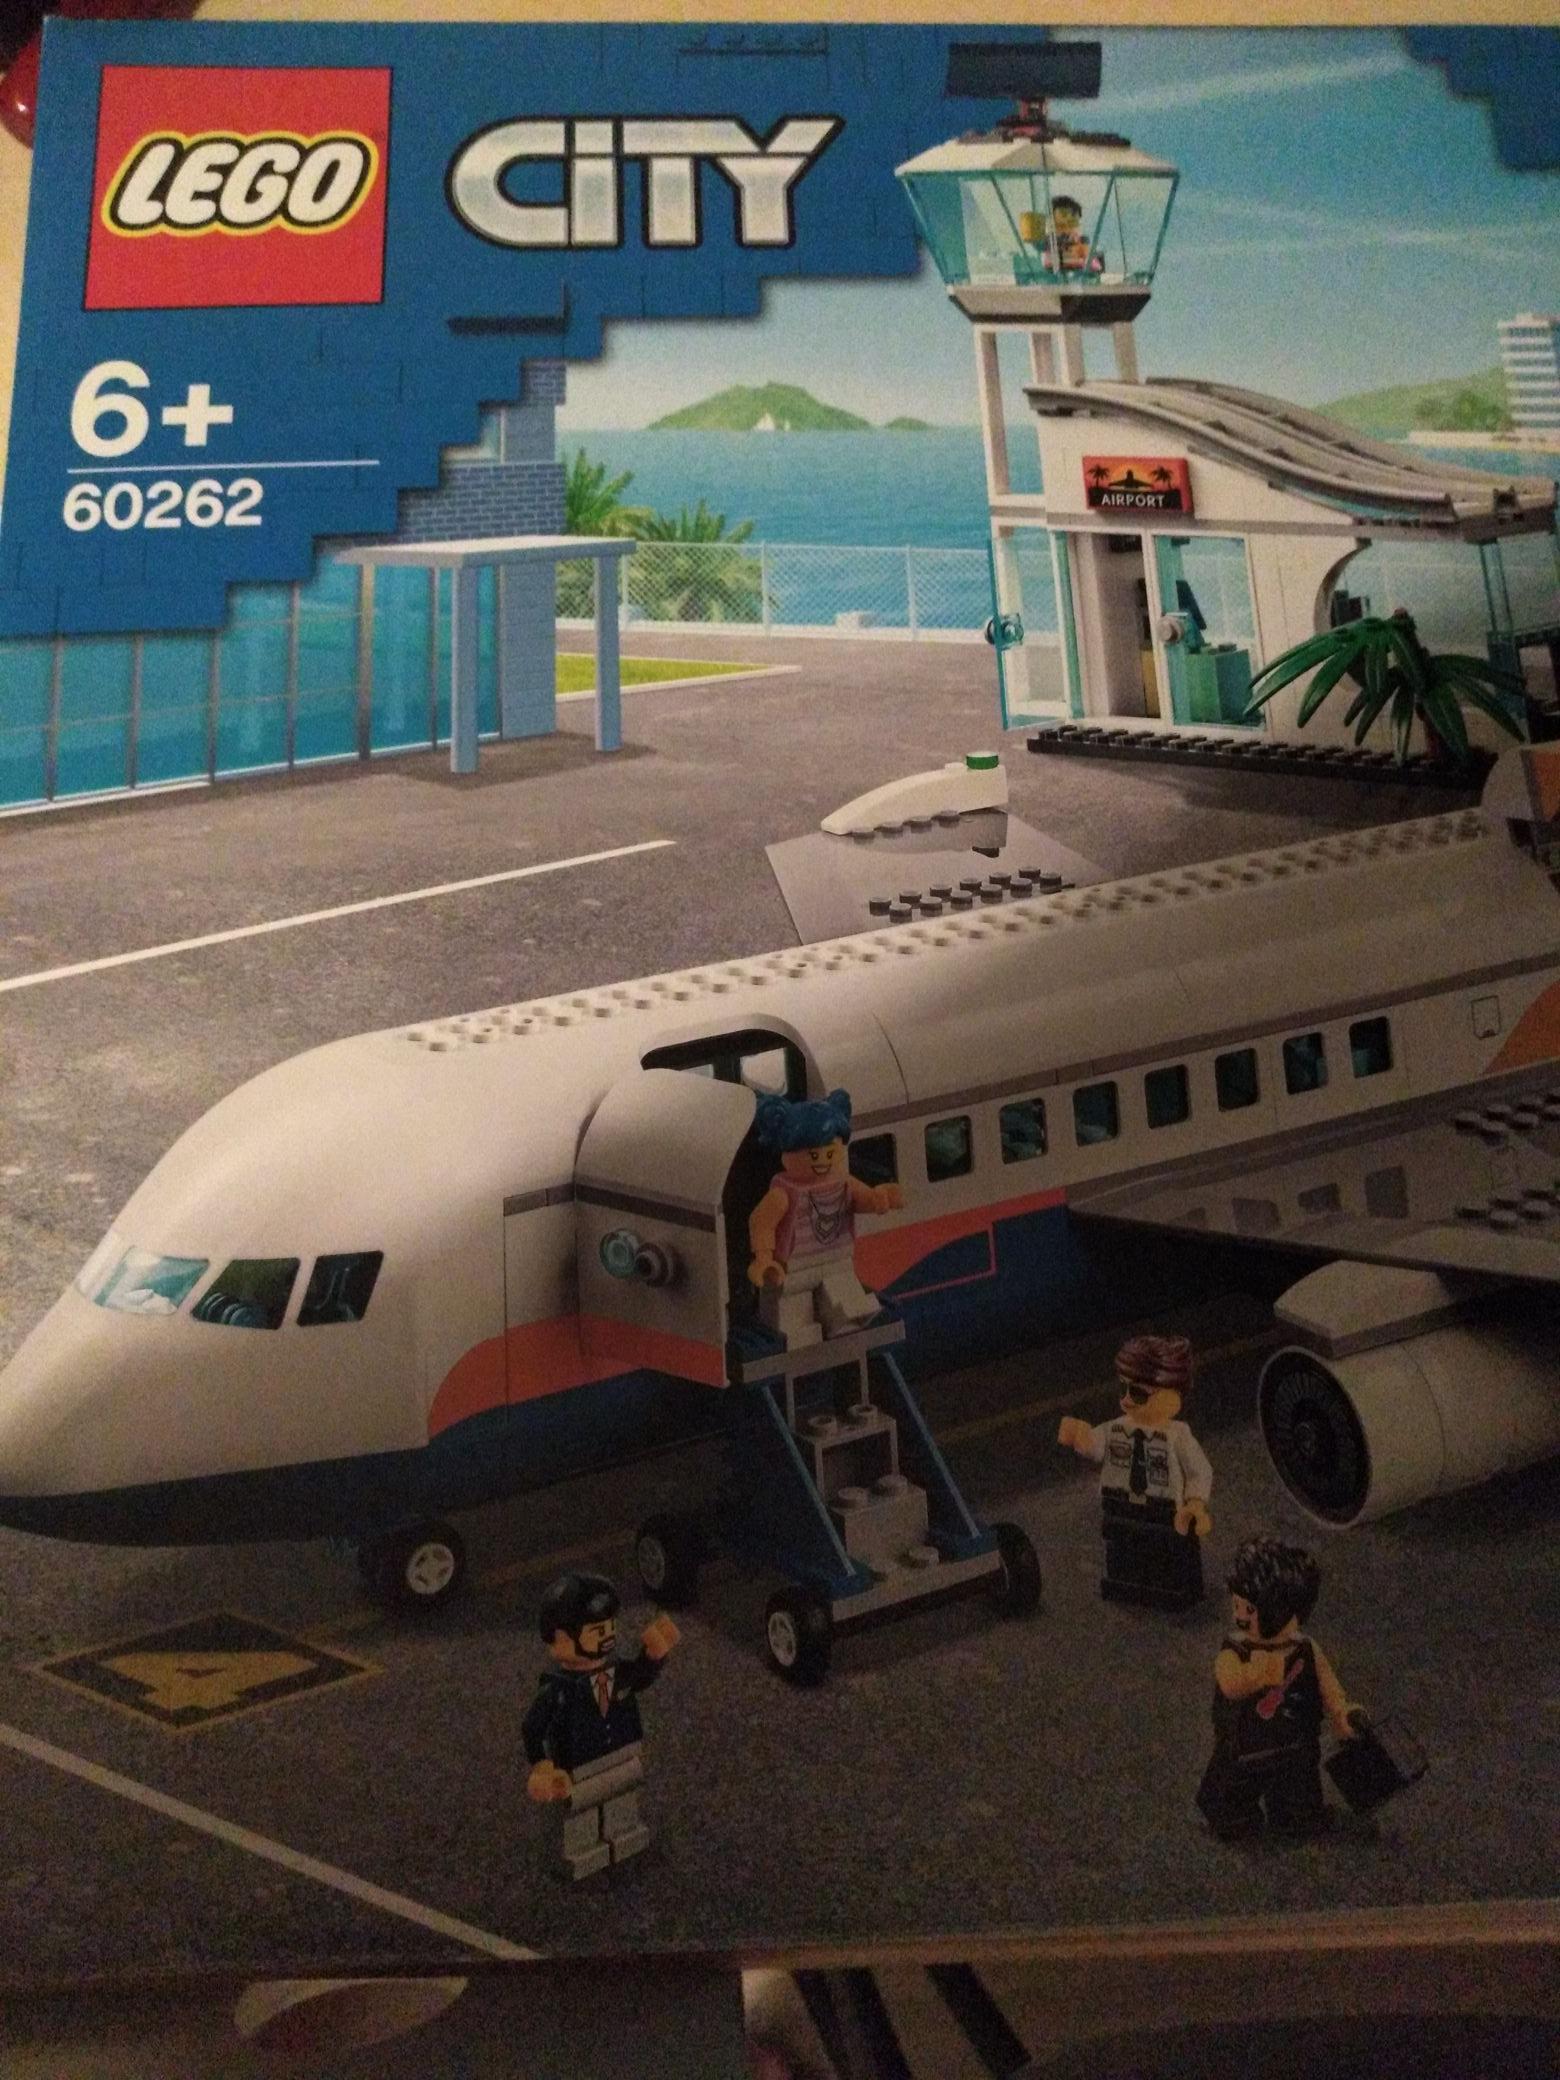 Lego city passagiersvliegtuig @amazon.nl 60262